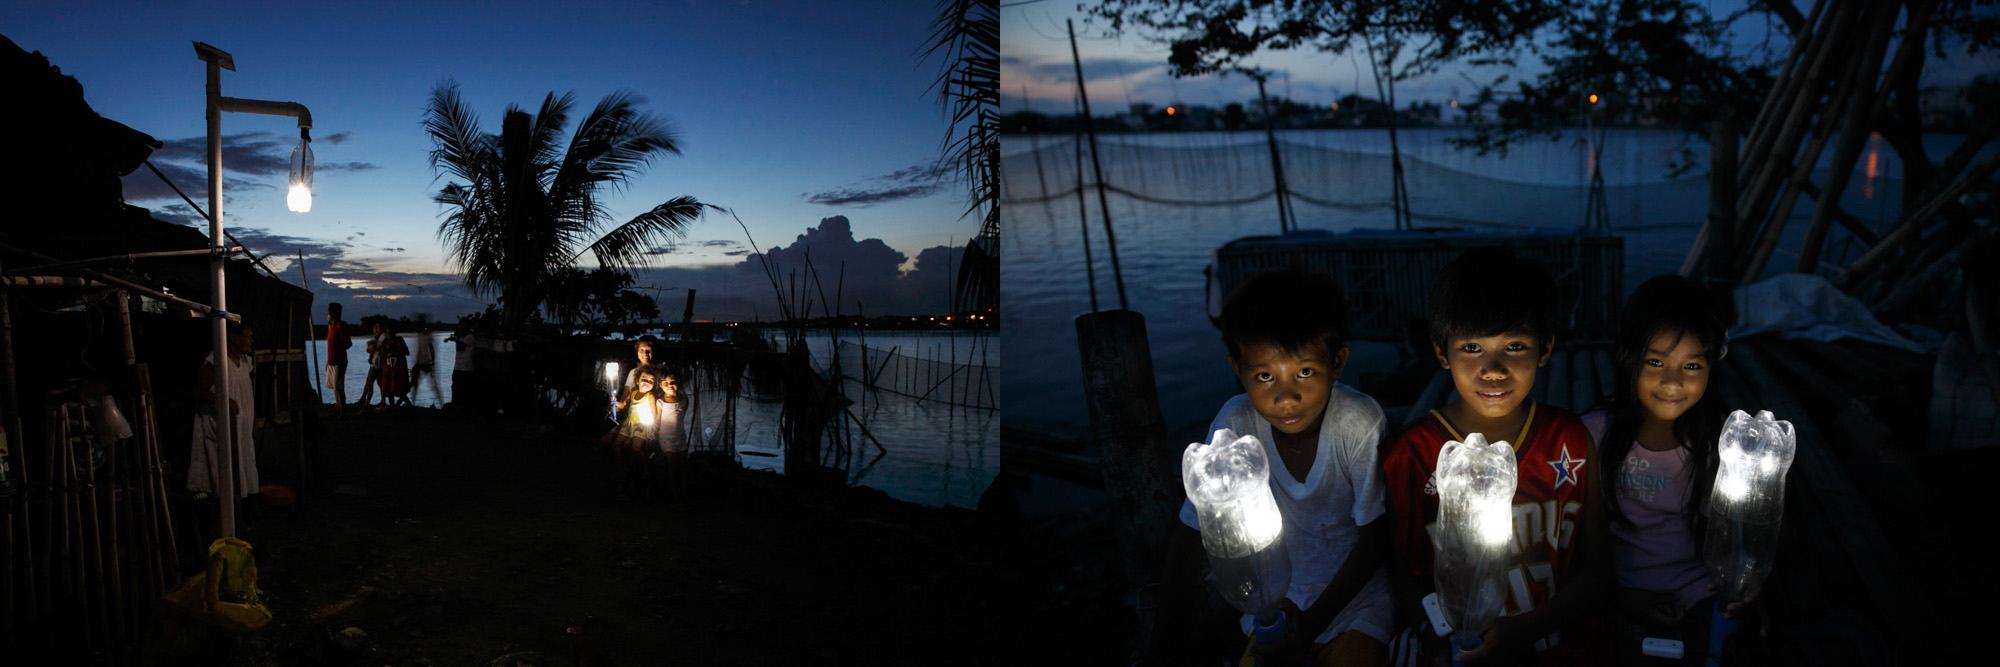 CLIENT: PepsiCo/Liter of Light SHOOT LOCATION: Philippines